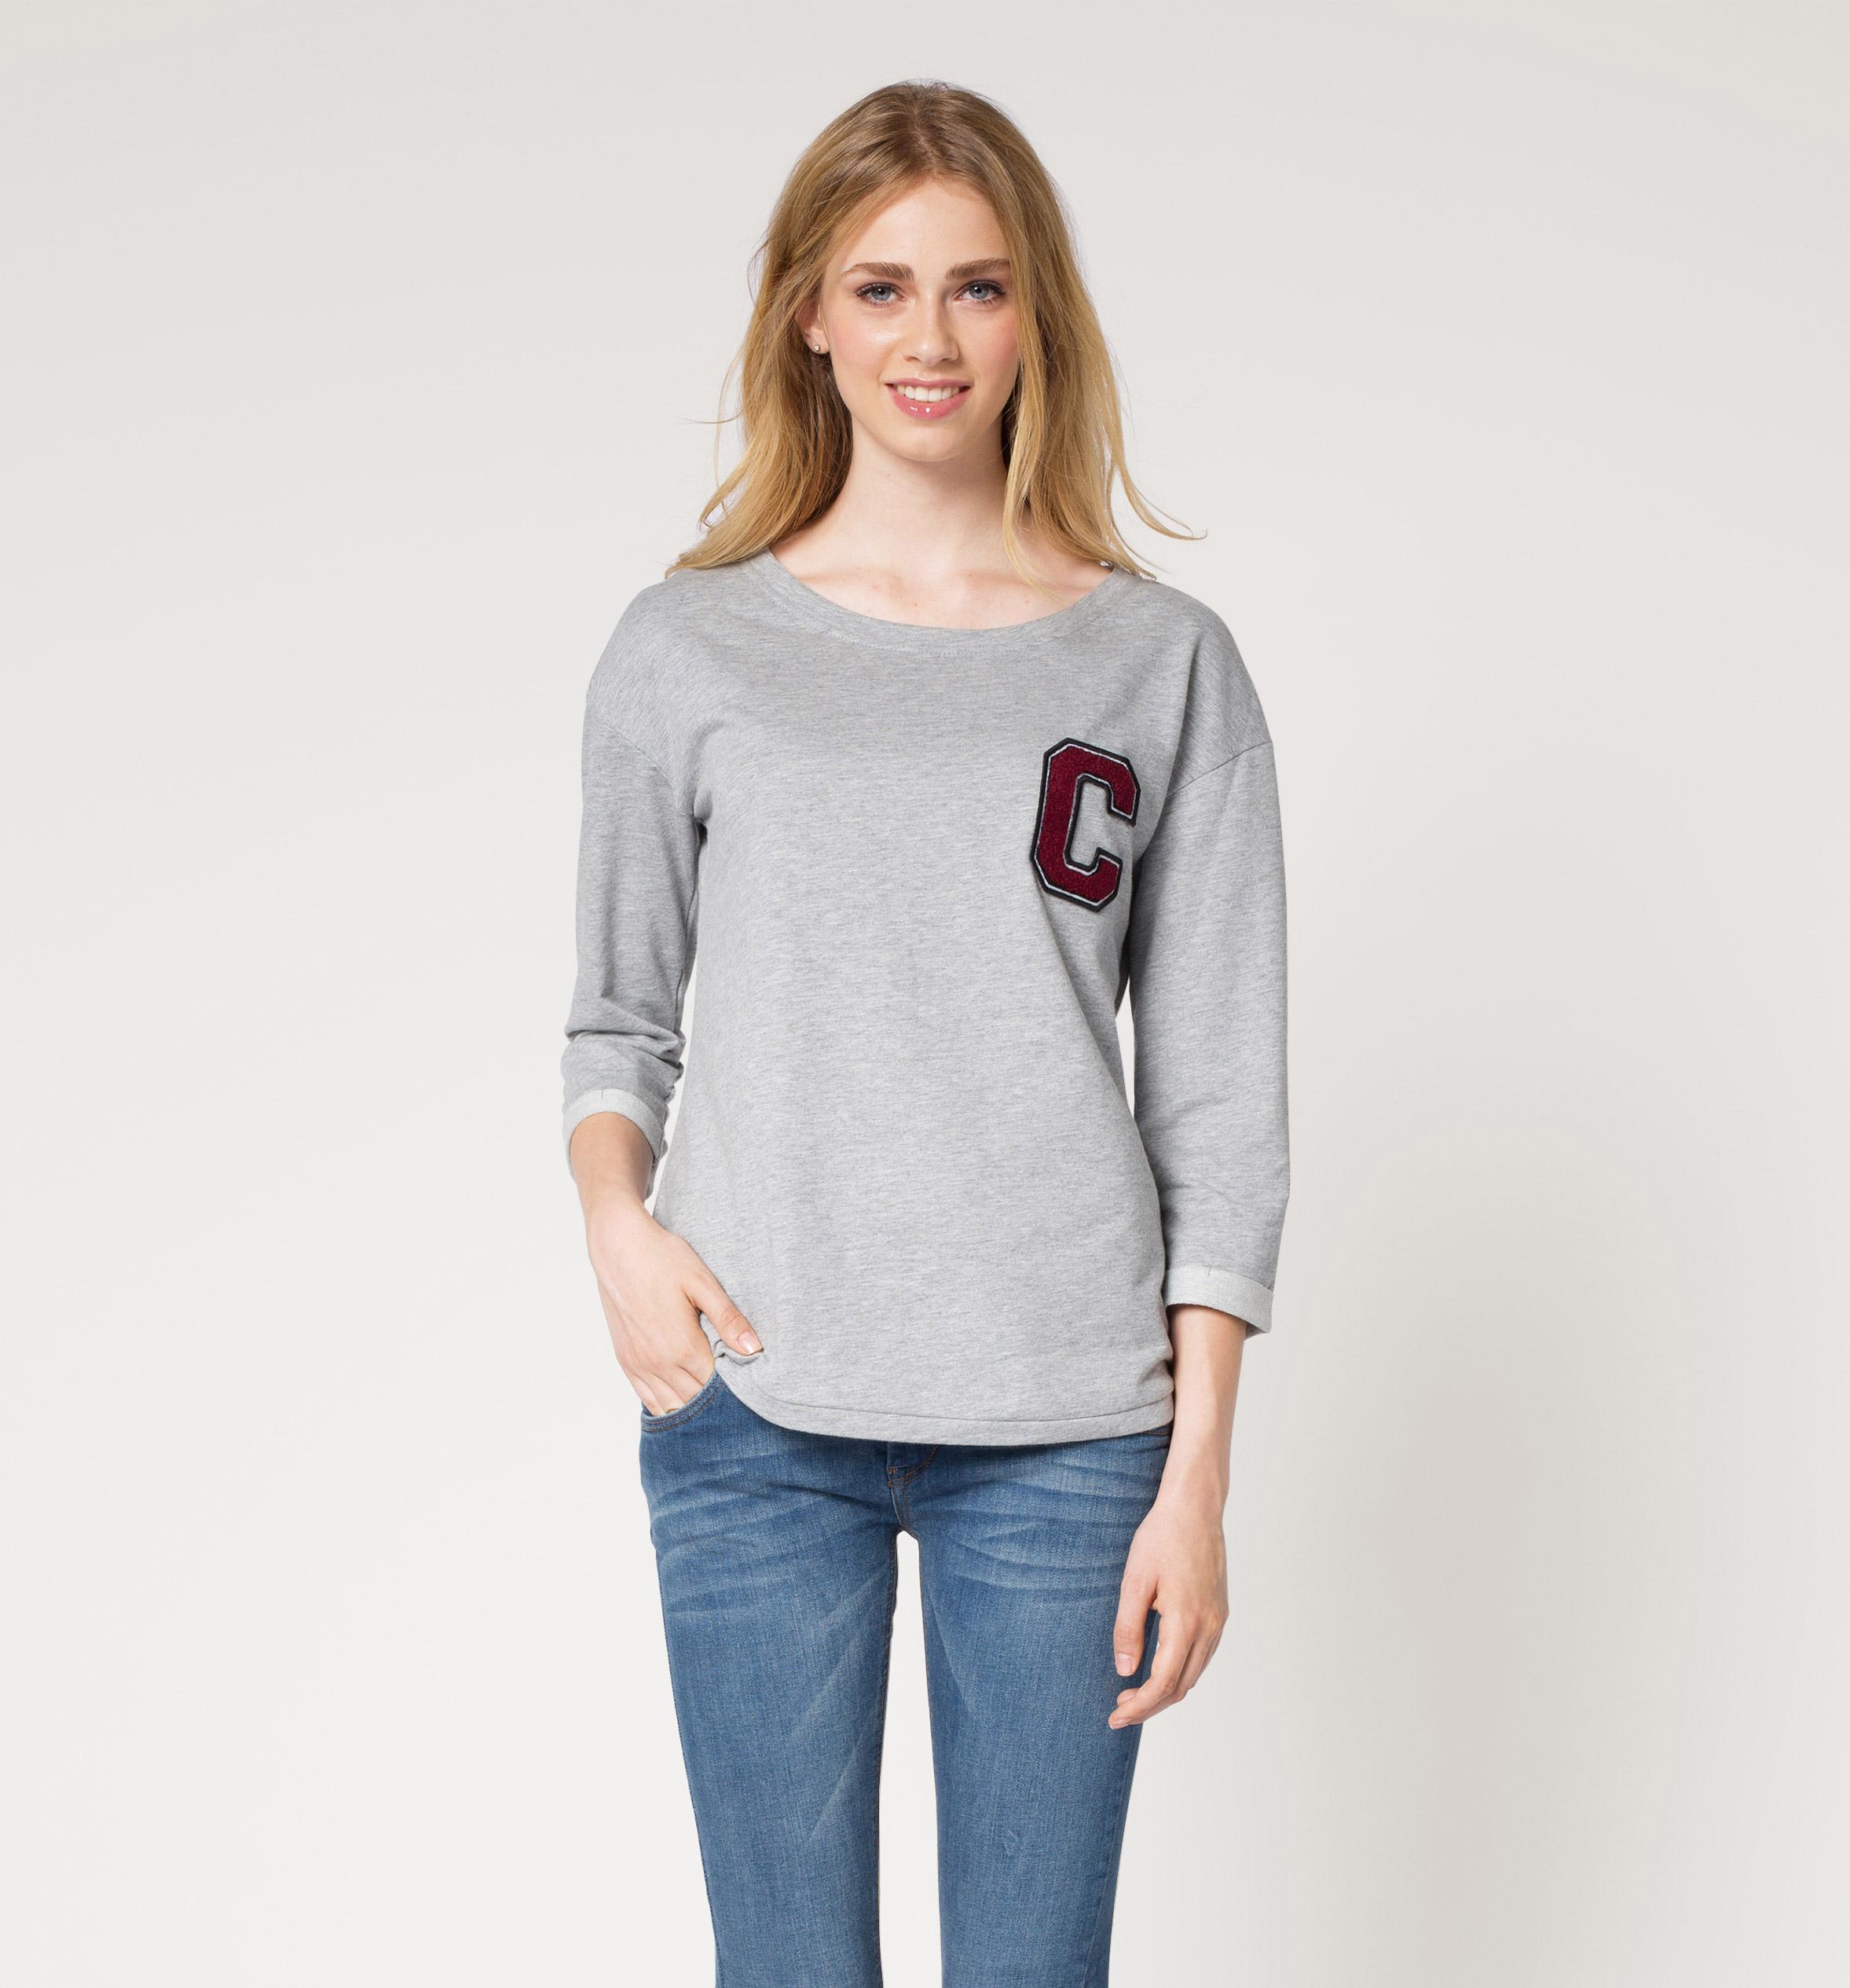 Sweatshirt in hellgrau - Damen {category.name} günstig. Inspiriert vom Leben - C&A